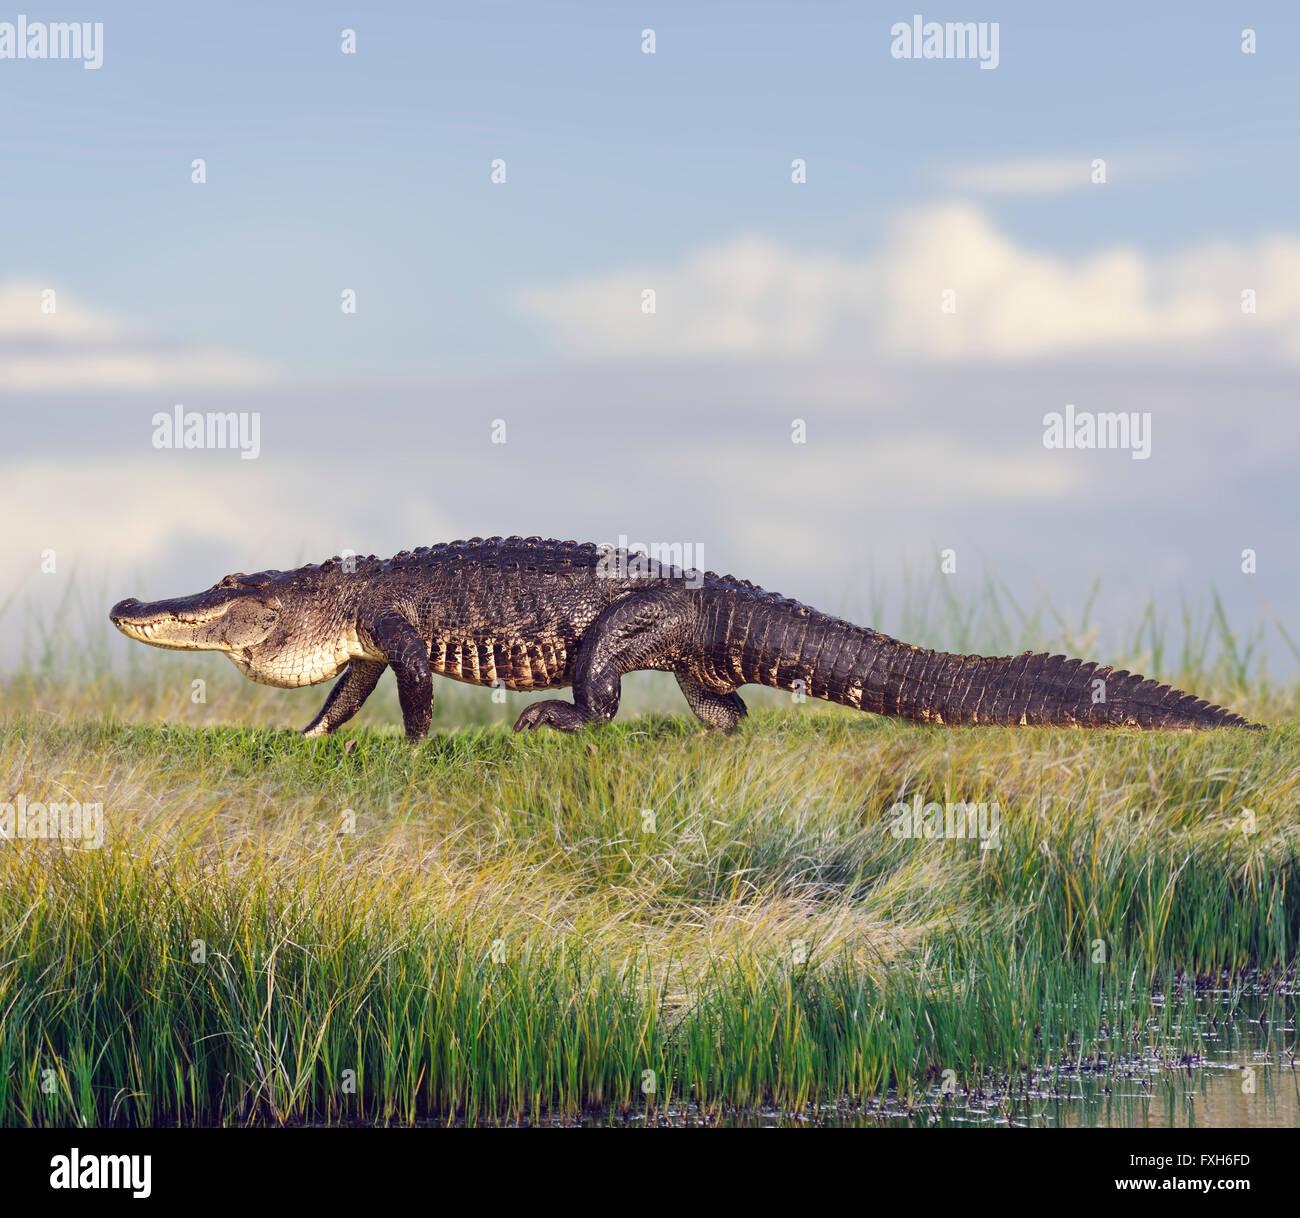 Großen Florida Alligator in Feuchtgebieten Stockbild